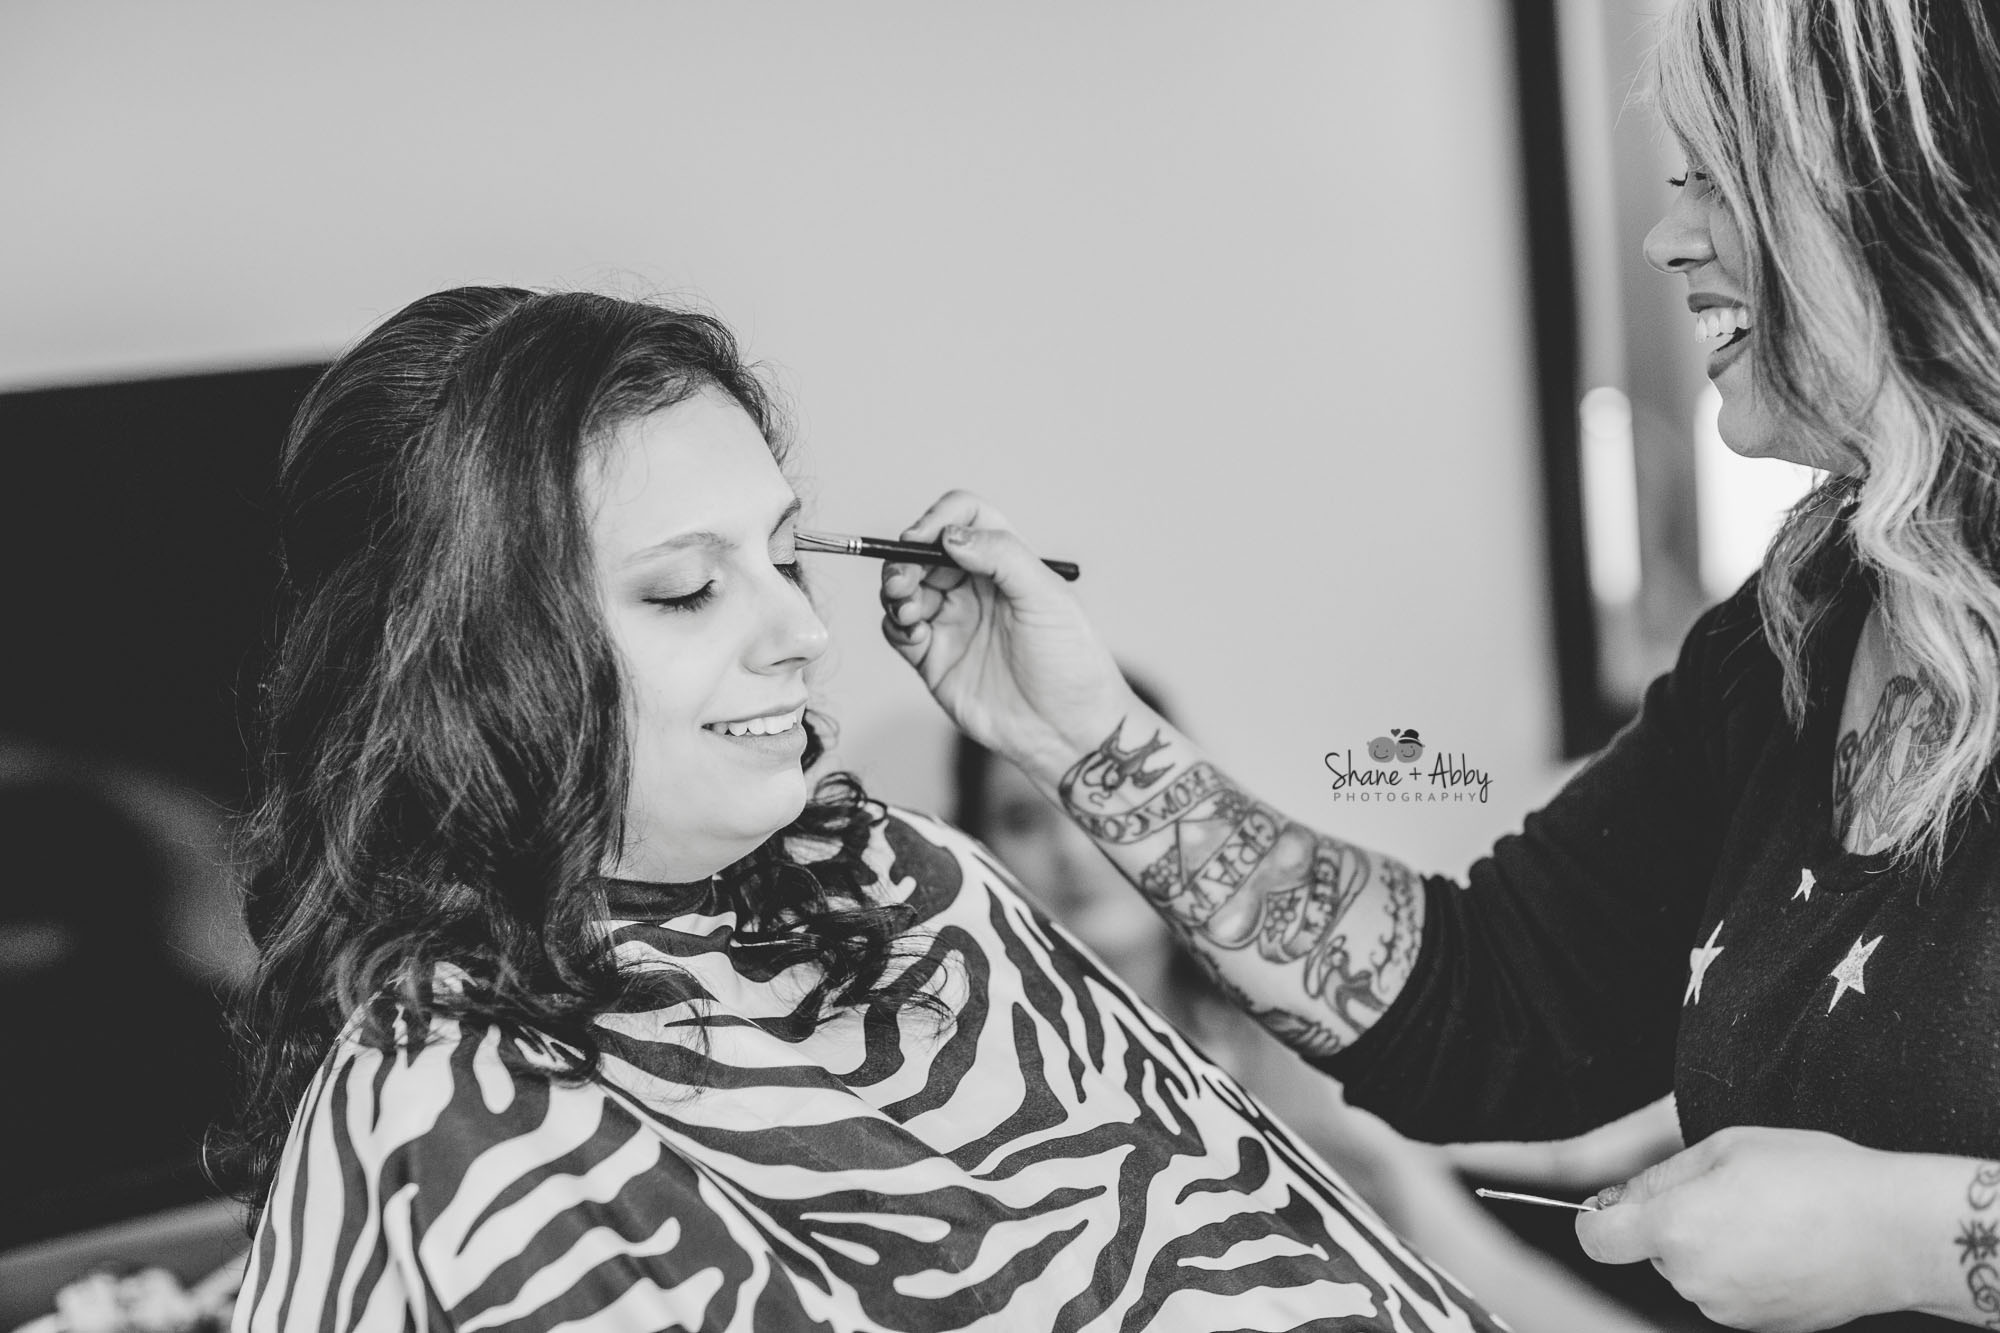 northwest indiana wedding makeup artist - krissy v | northwest